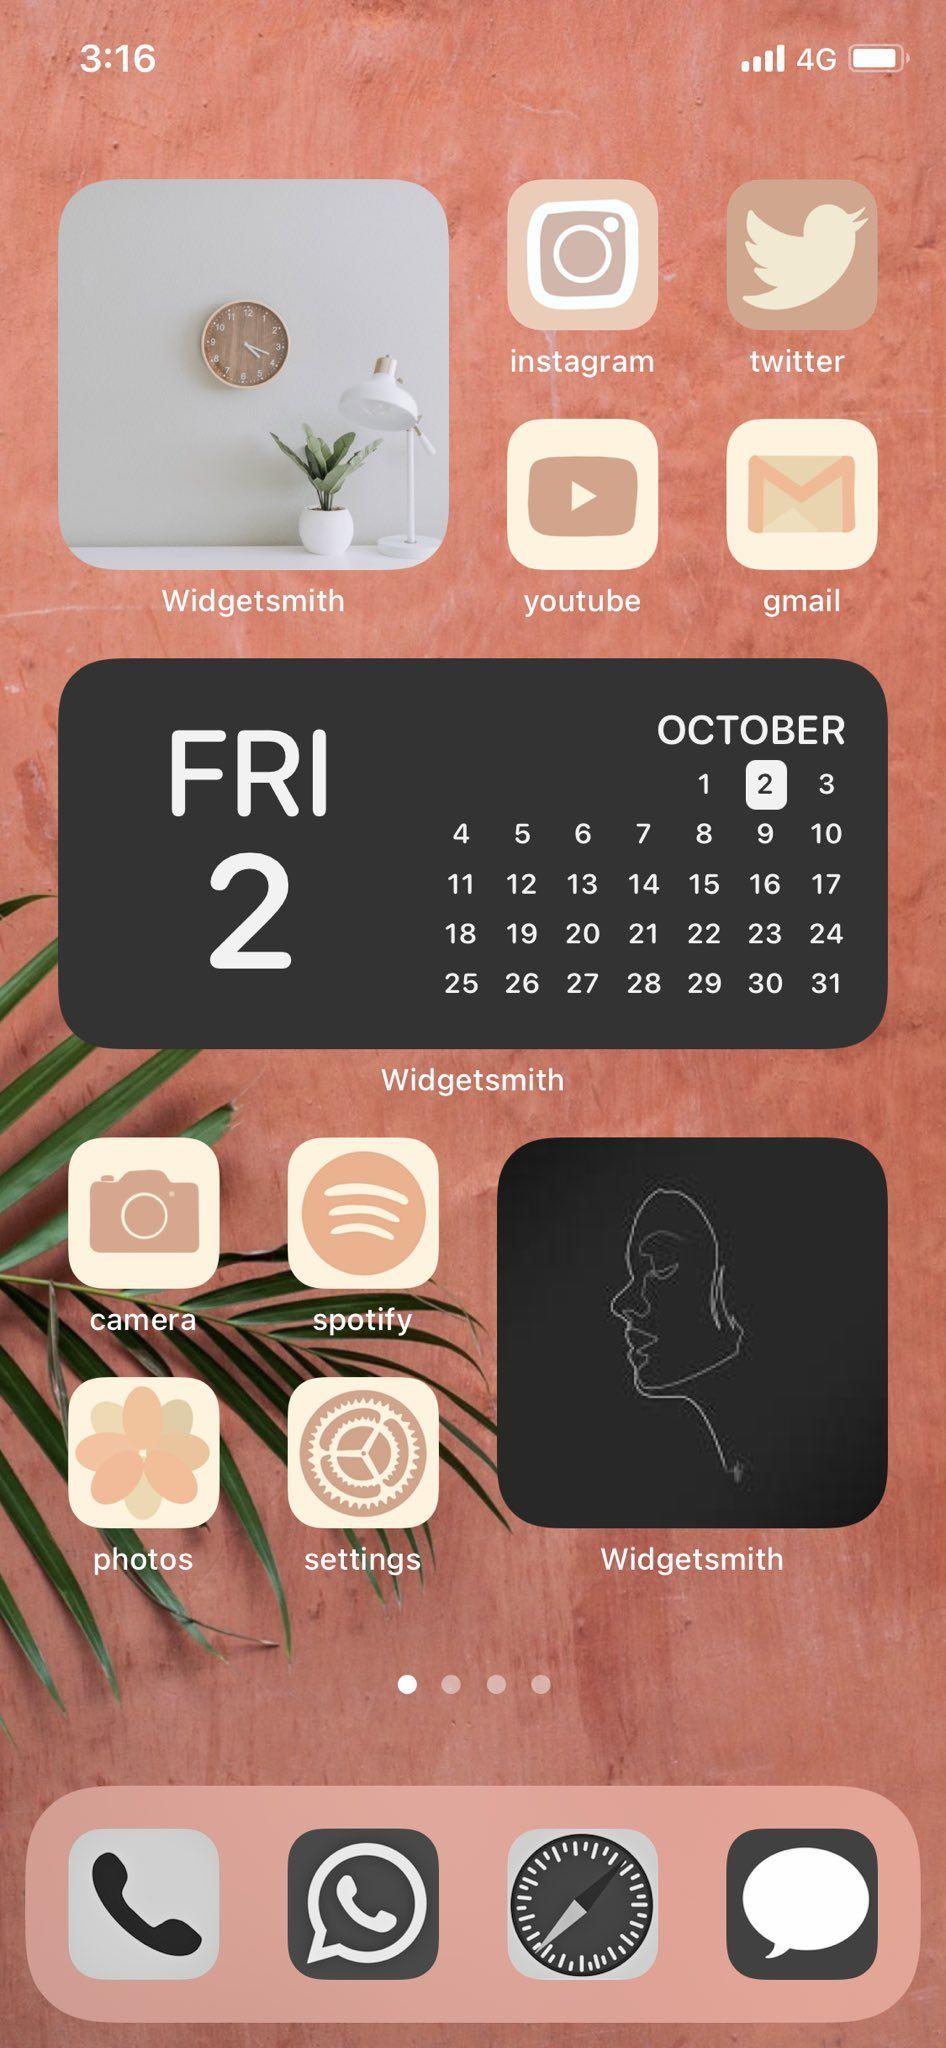 Aesthetic Home Screen Inspo Ios 14 Widget Photos Ios 14 App Covers Ios 14 App Icons Iphone Home Screen Layout Iphone Wallpaper App Iphone Apps